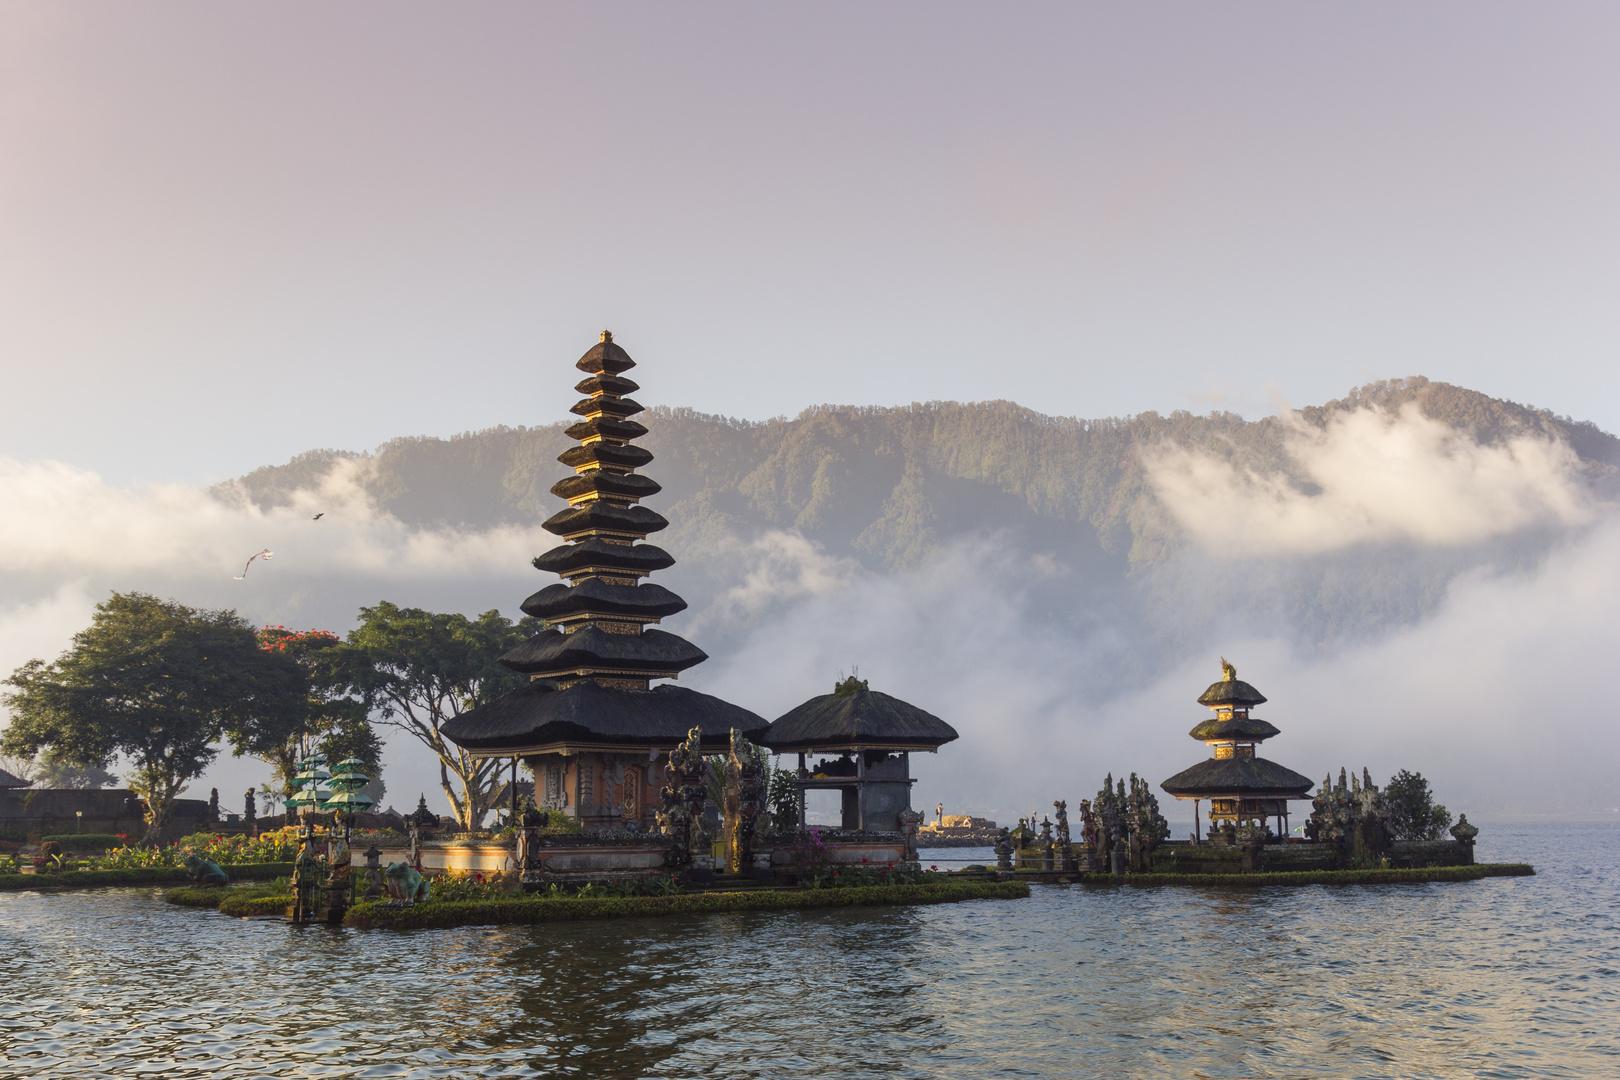 Pura Ulun Danu Bratan - Bali